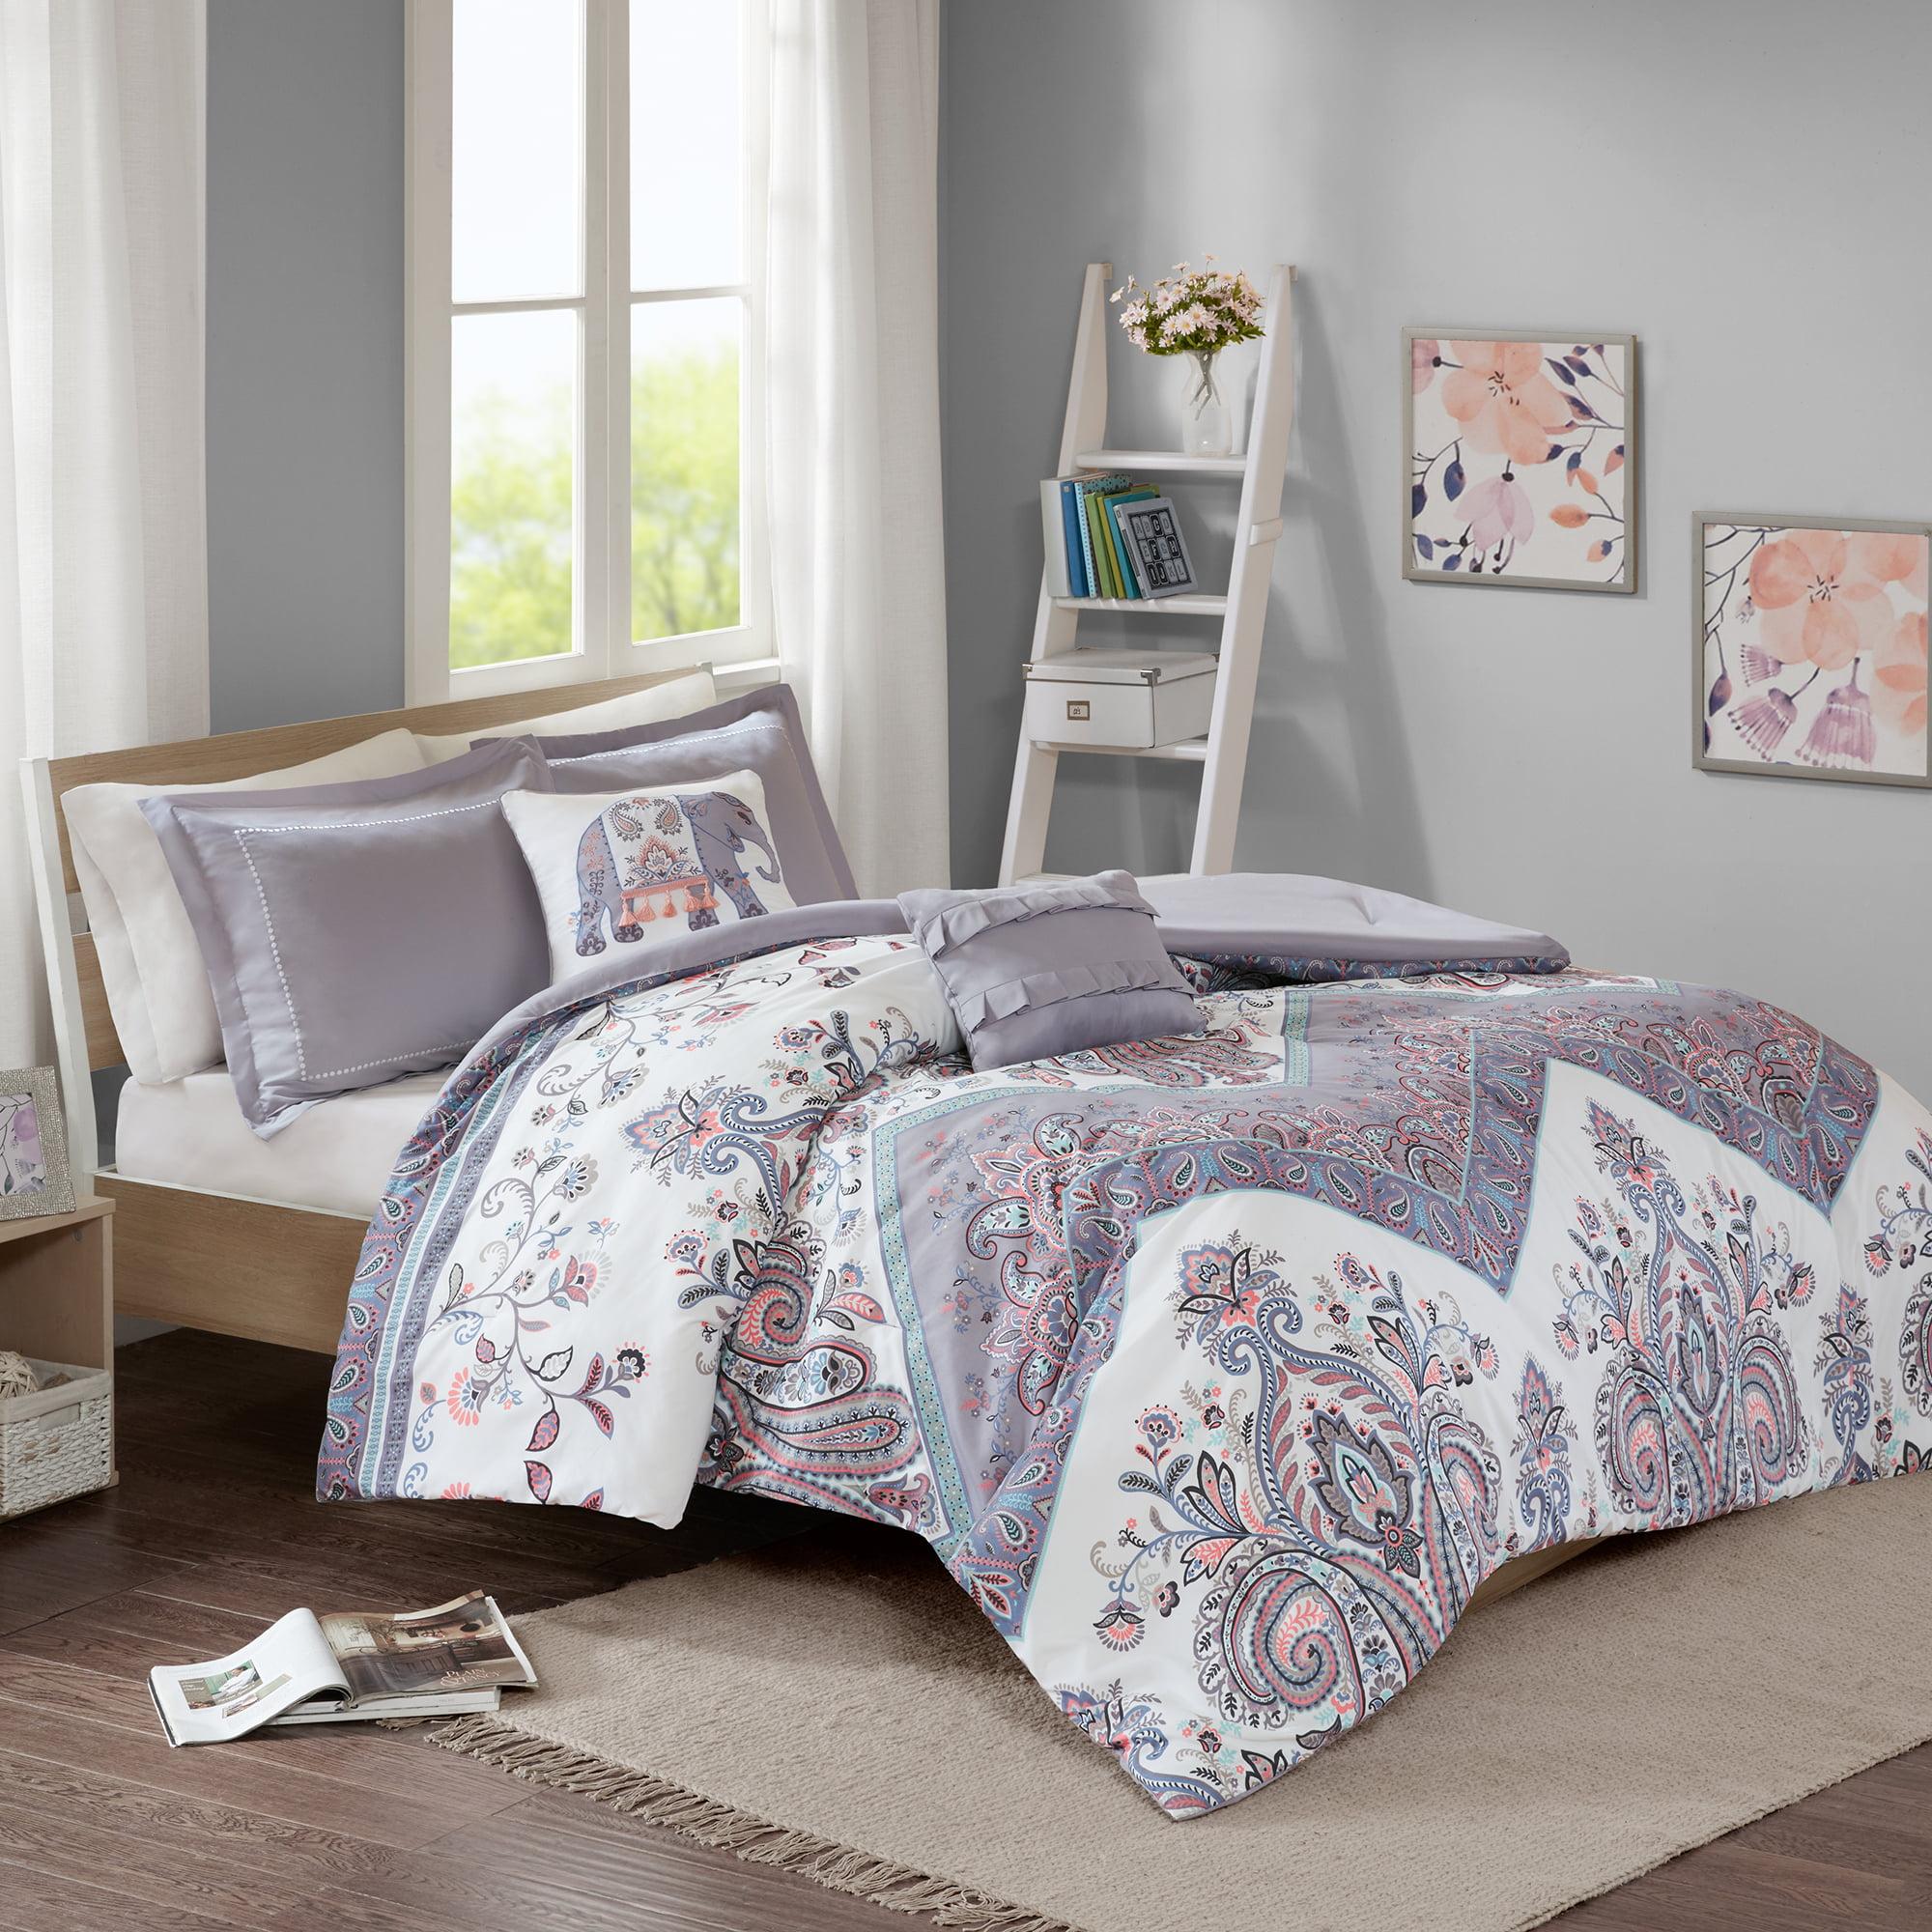 Home Essence Apartment Anna Printed Comforter Bedding Set